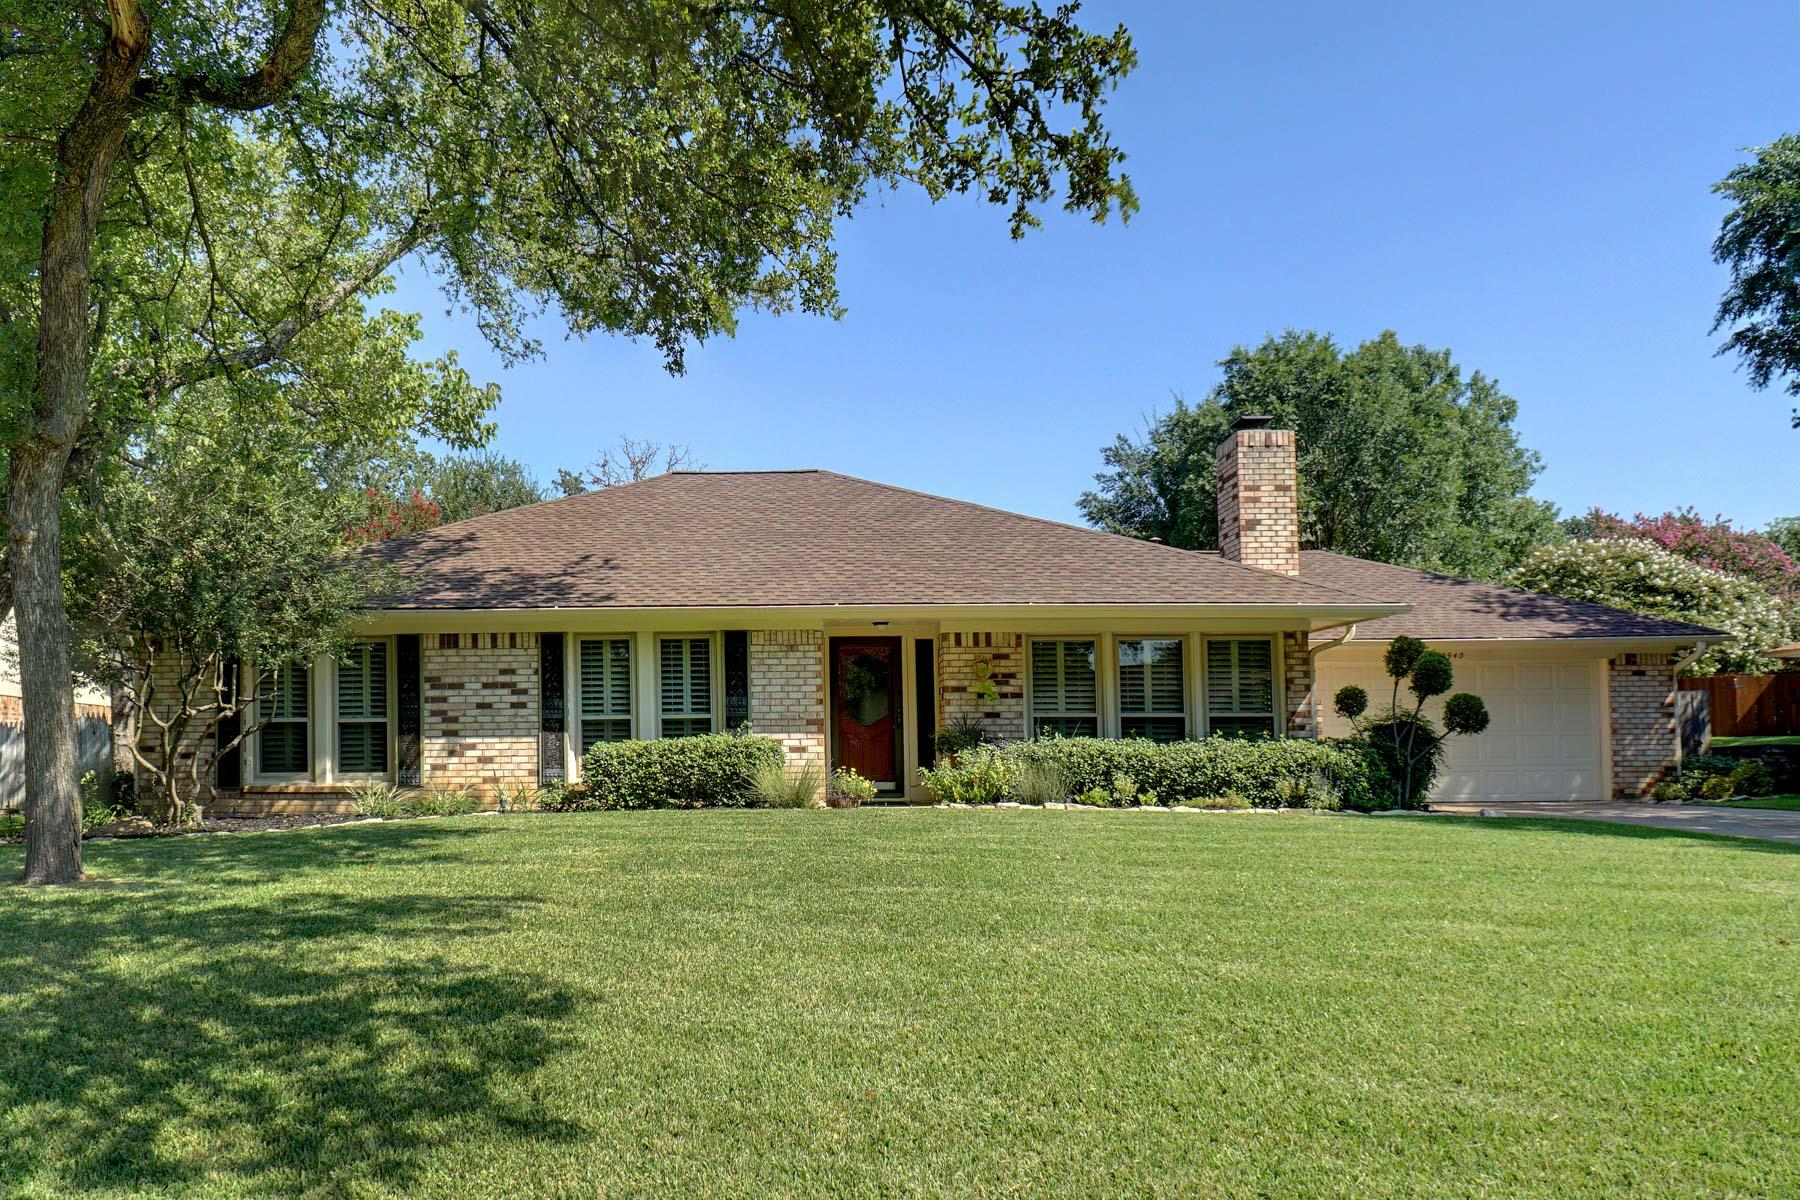 واحد منزل الأسرة للـ Sale في Updated Home In Established Neighborhood 2940 Southridge Drive Grapevine, Texas, 76051 United States